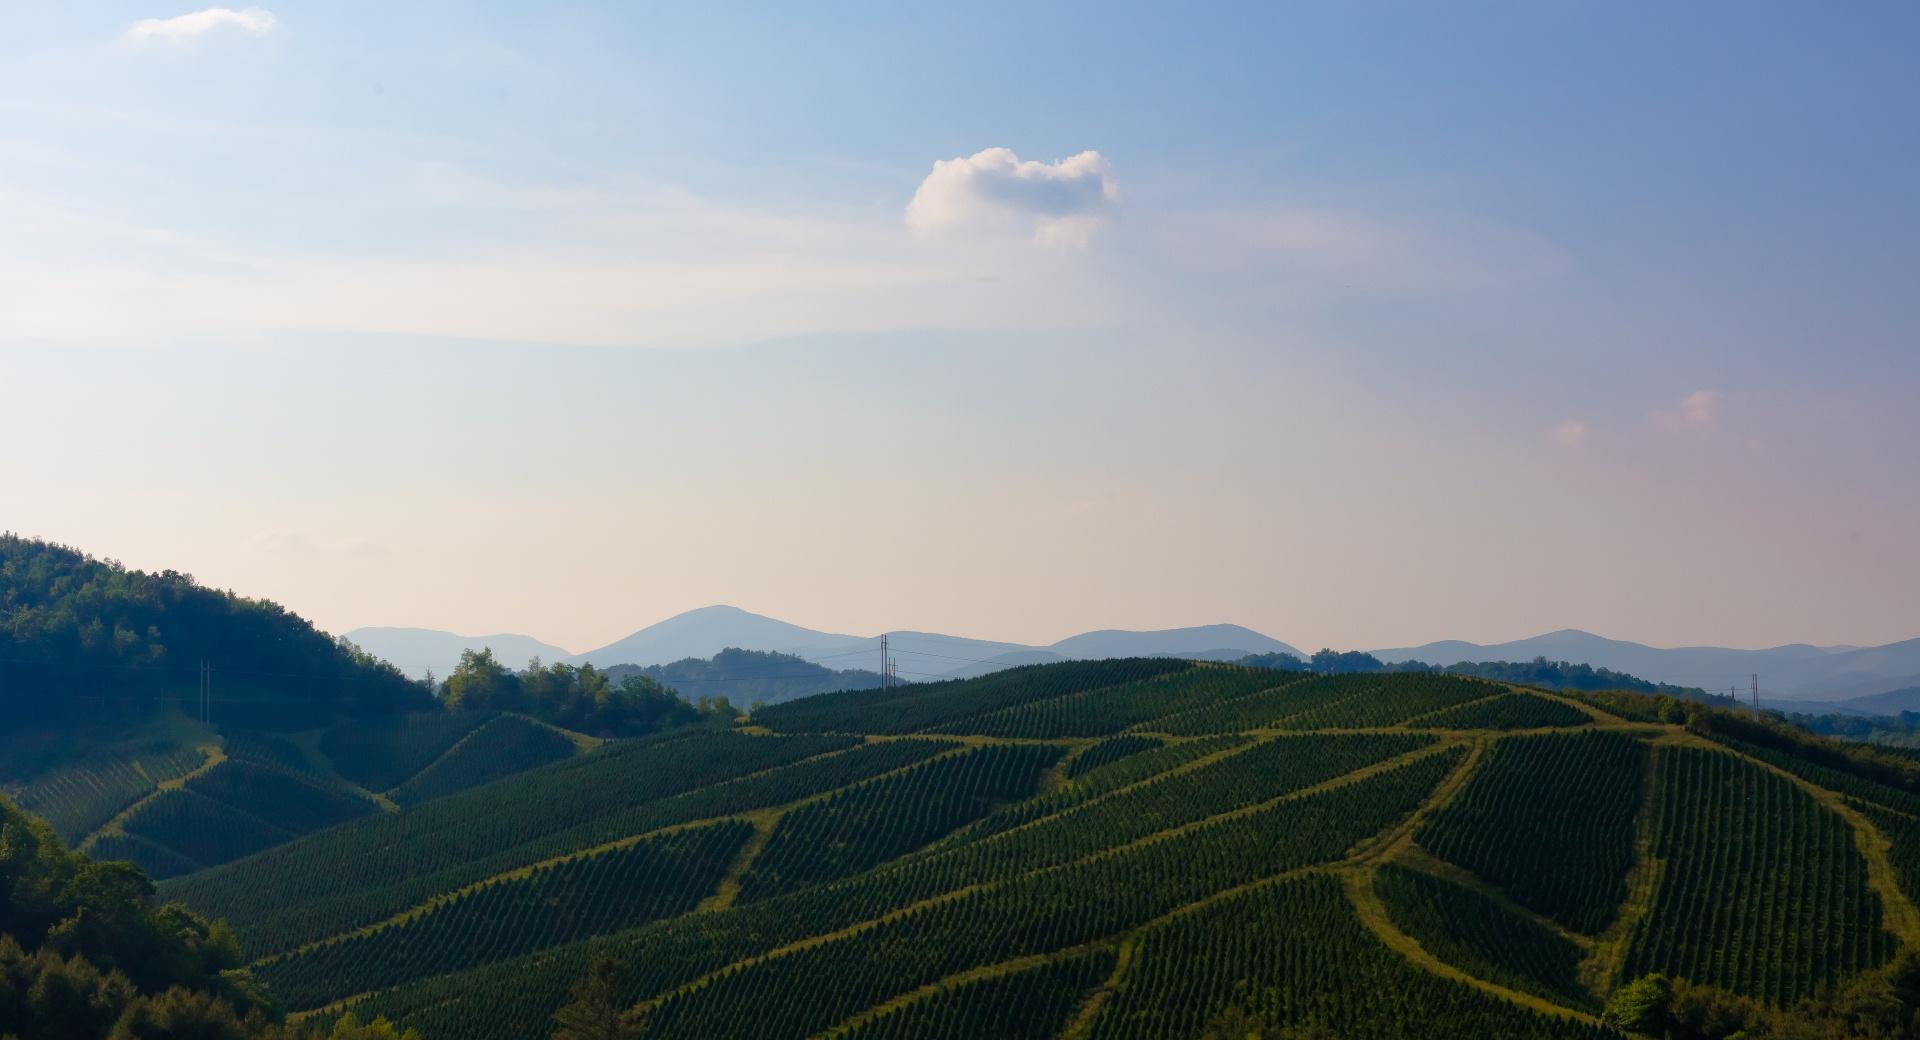 Evergreen Ridge wallpapers HD quality